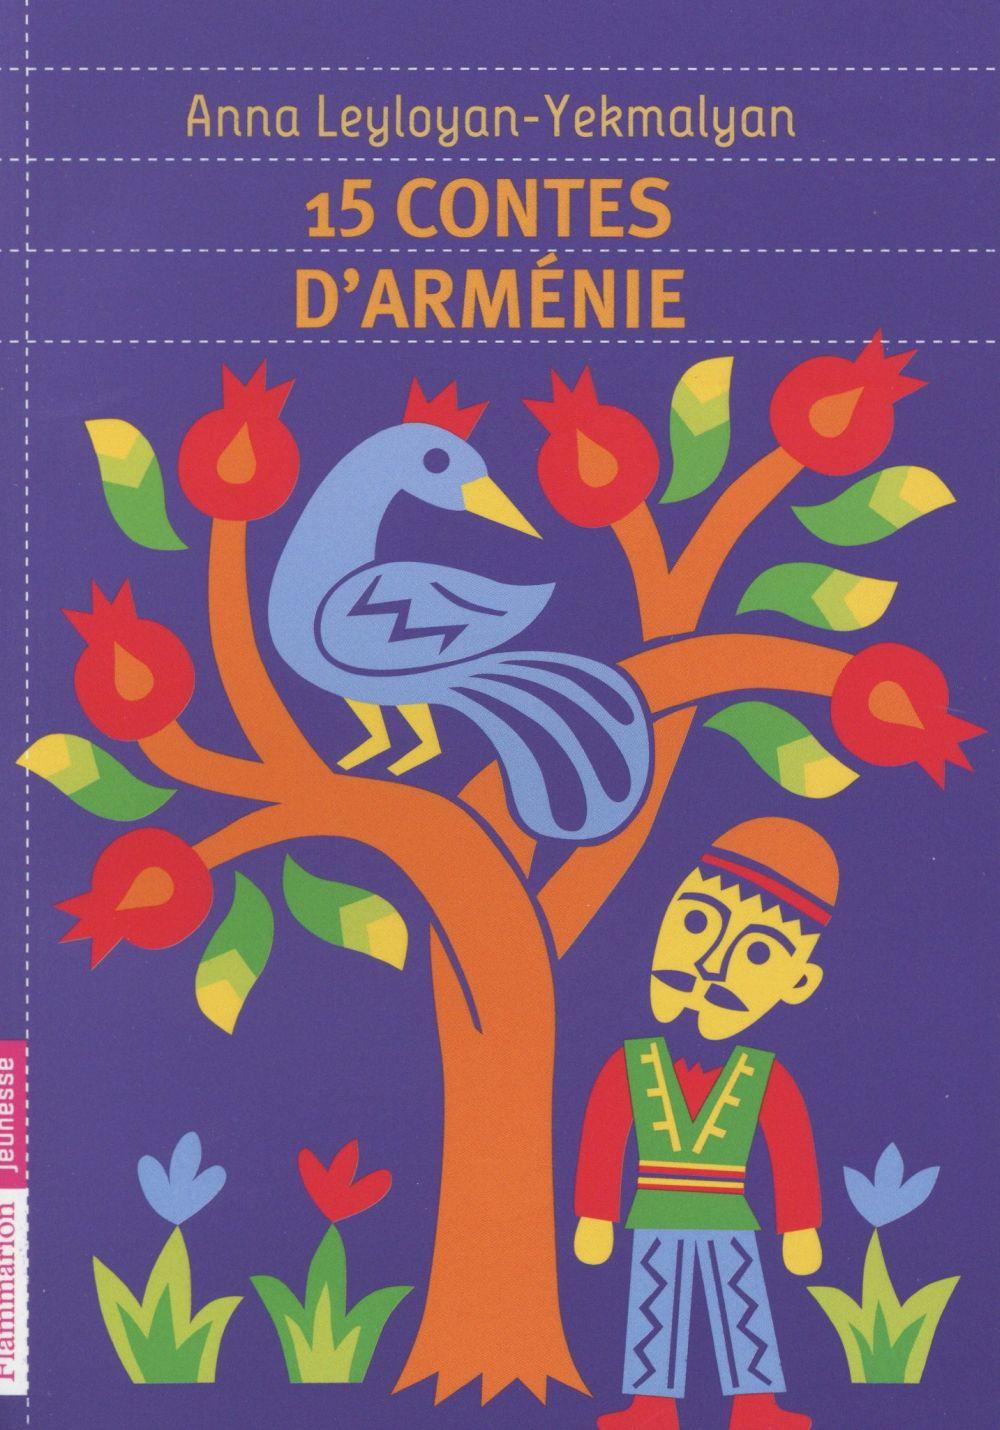 15 contes d'Armenie